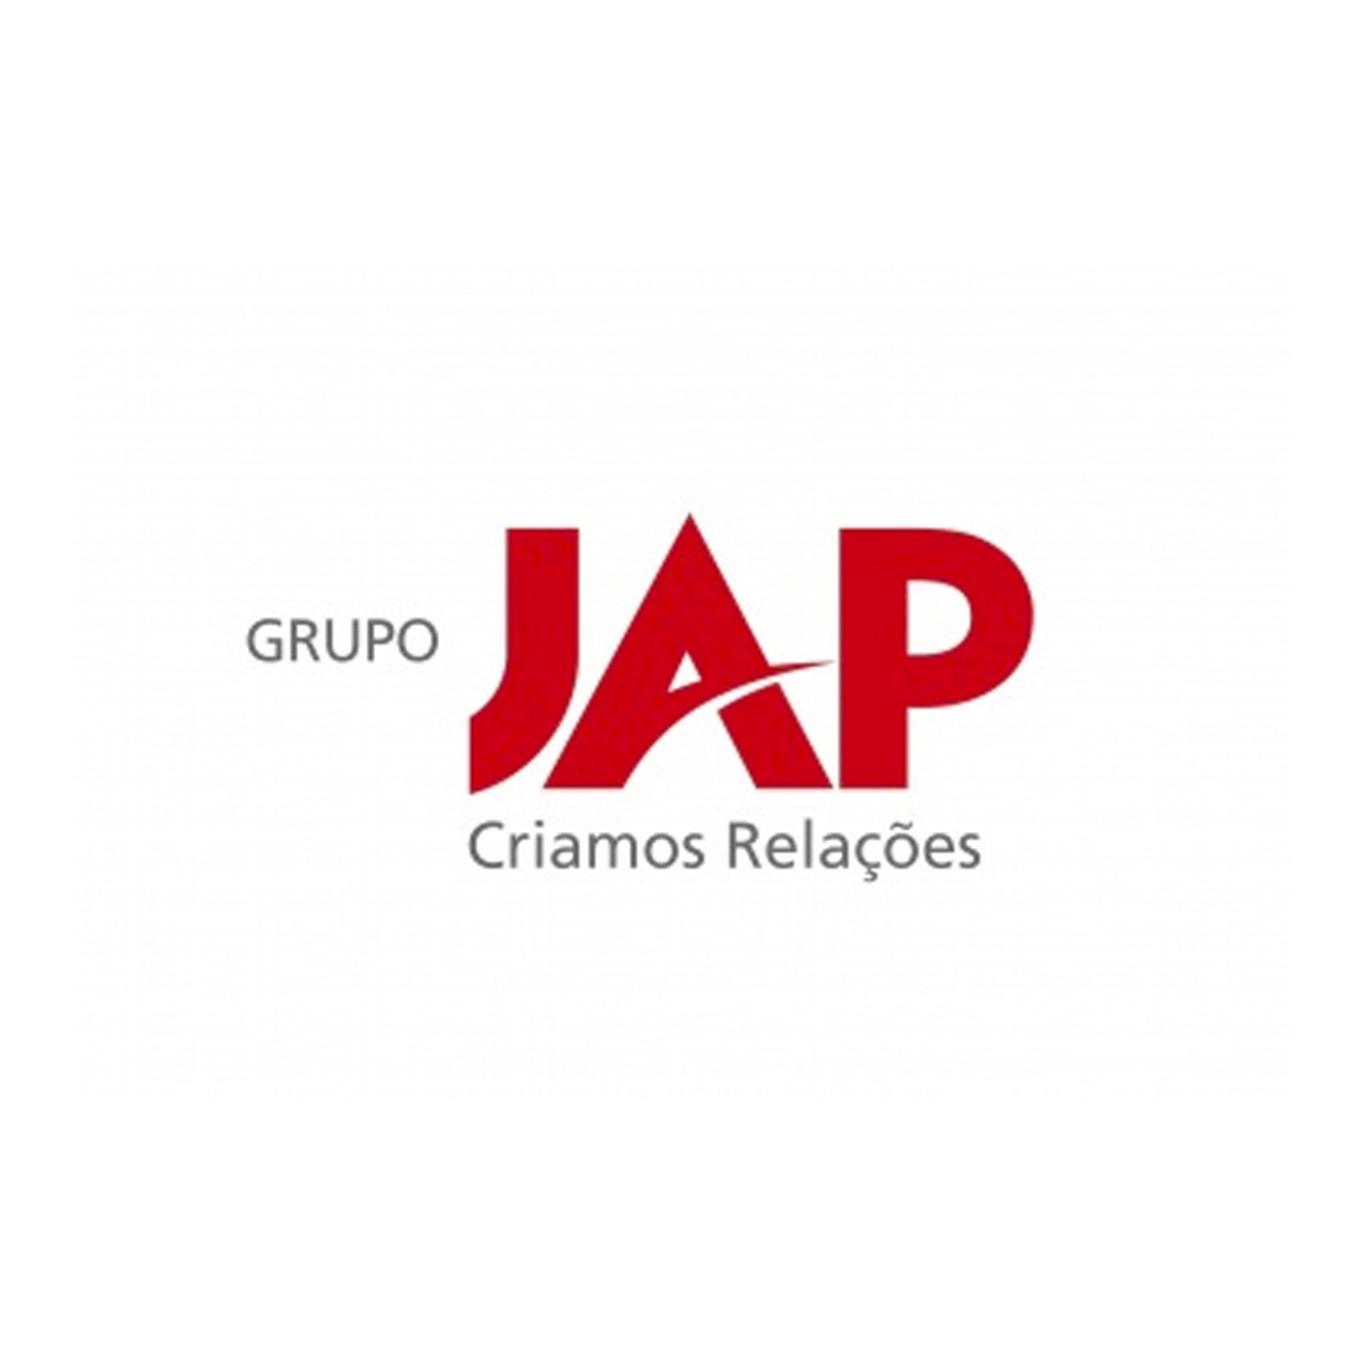 https://statusviagens.com/wp-content/uploads/2020/09/parceiros_grupo-jap.jpg